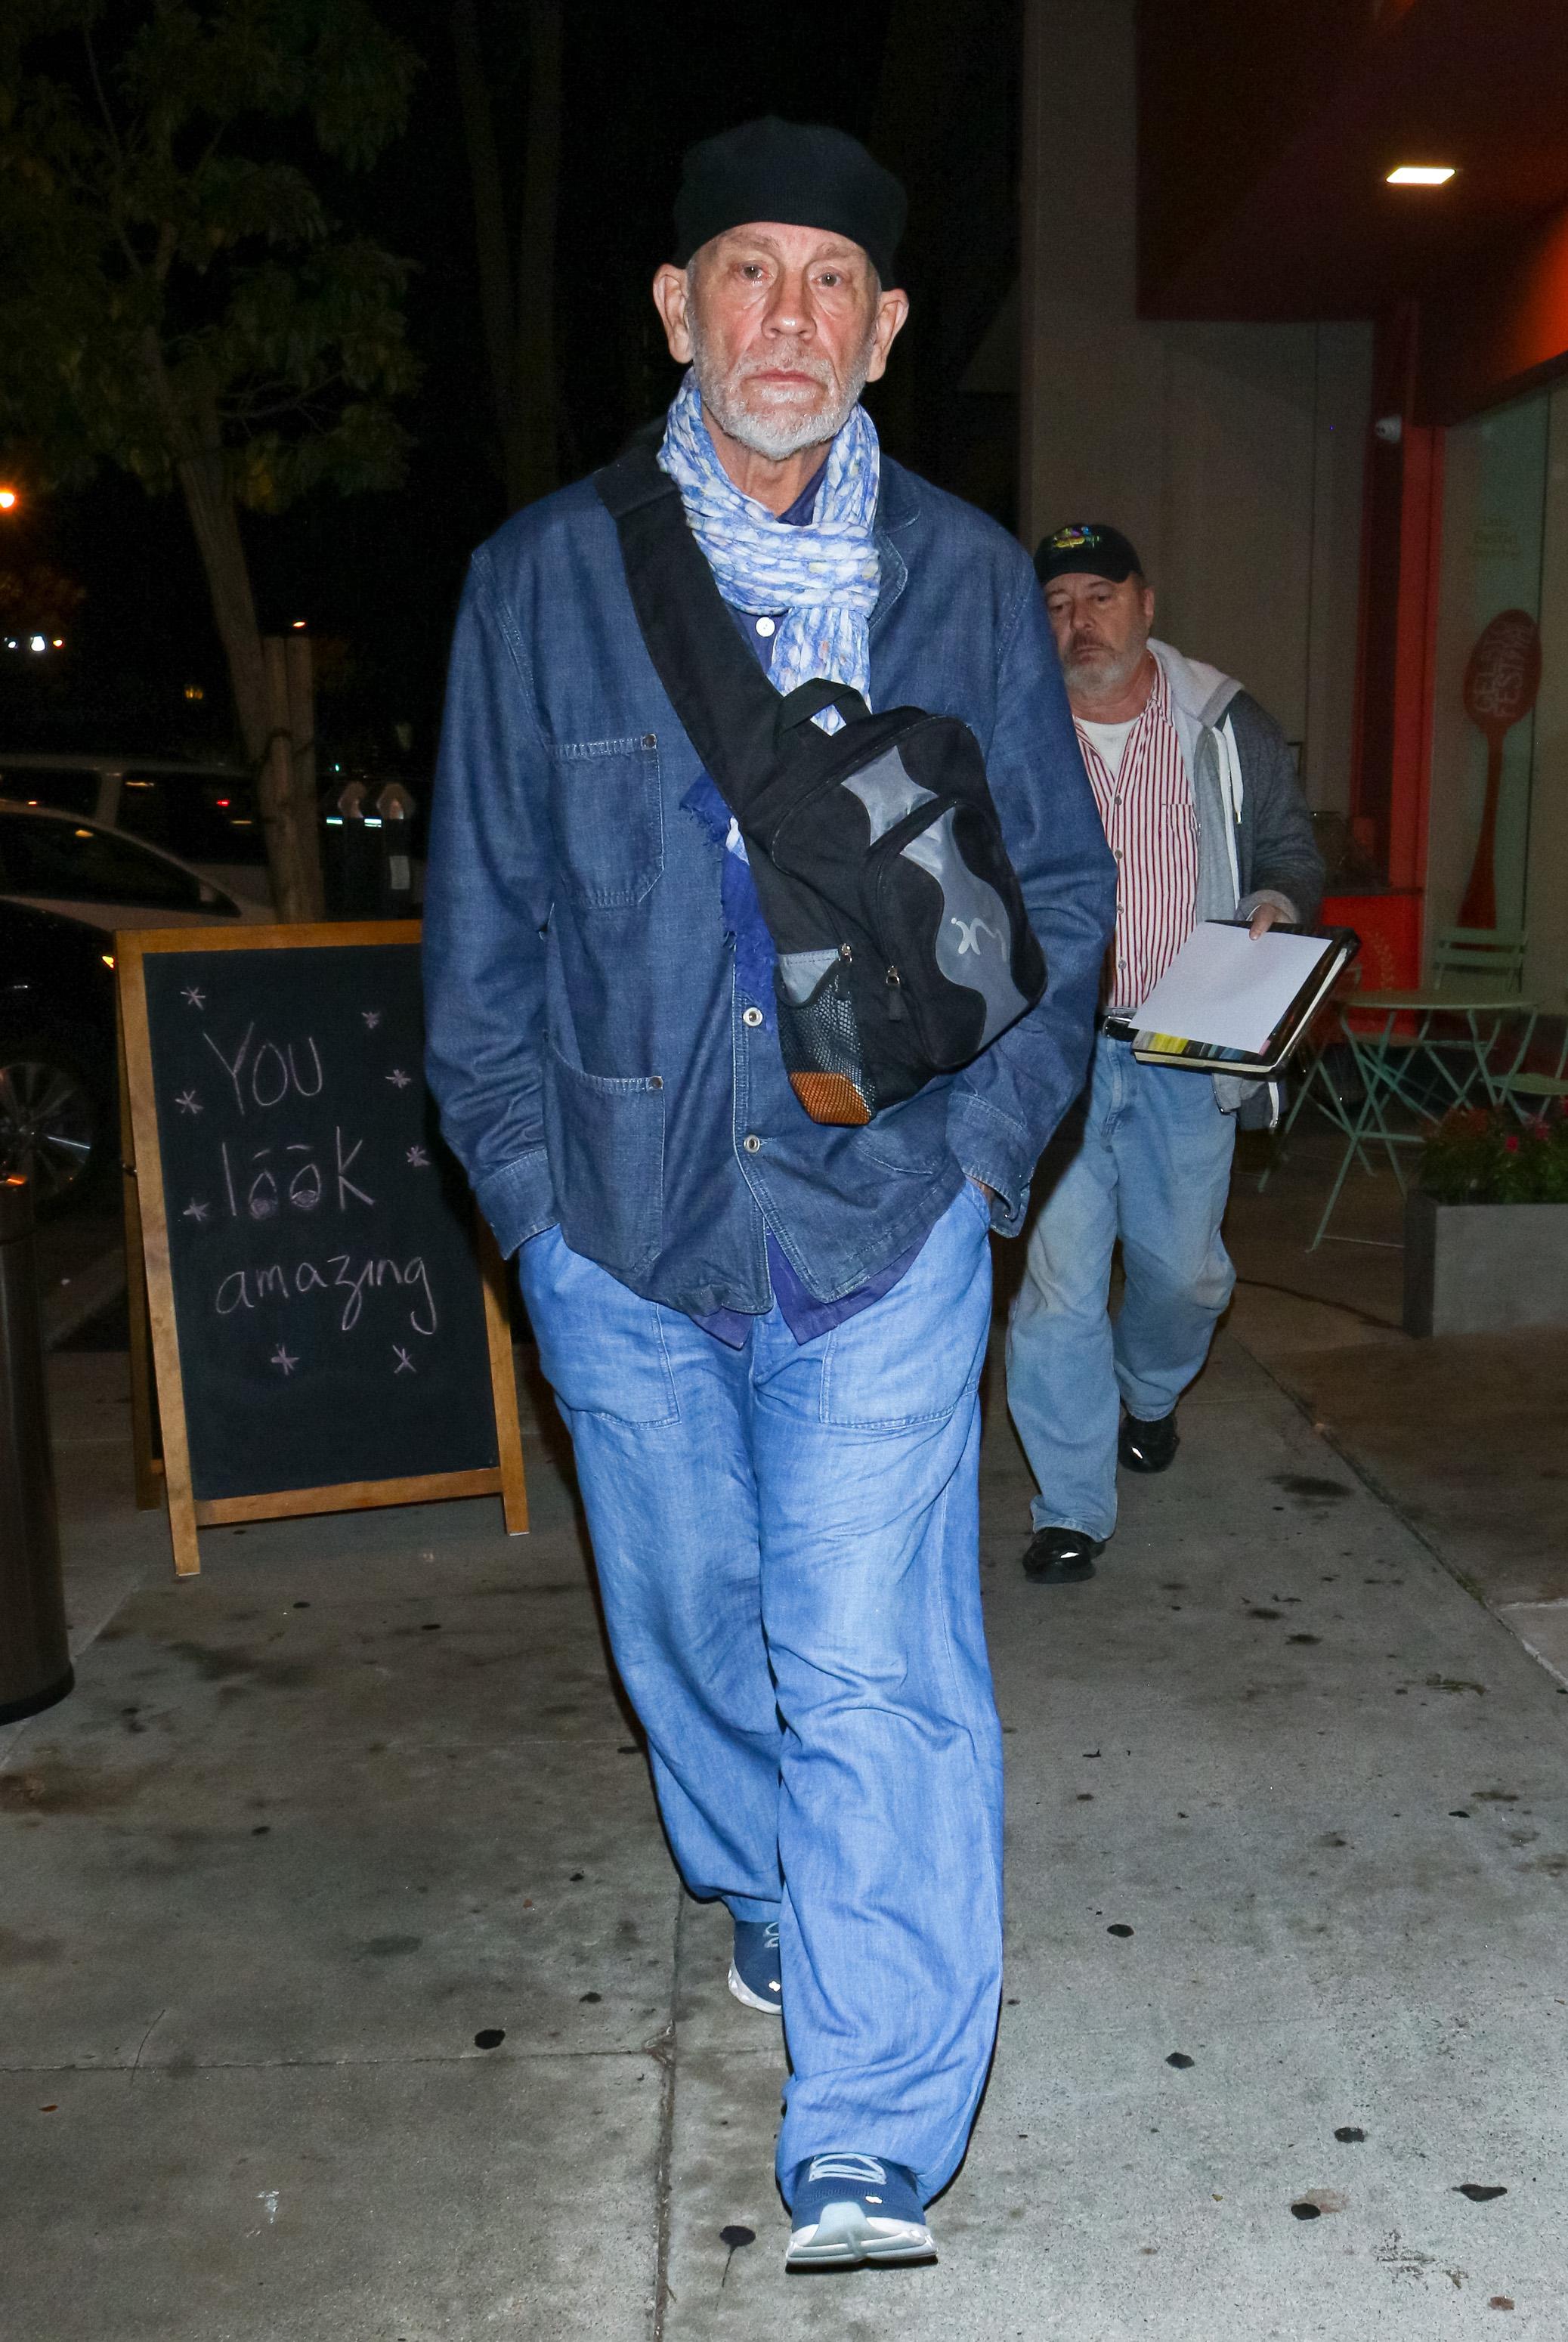 LOS ANGELES, CA - NOVEMBER 16: John Malkovich is seen on November 16, 2019 in Los Angeles, California. (Photo by